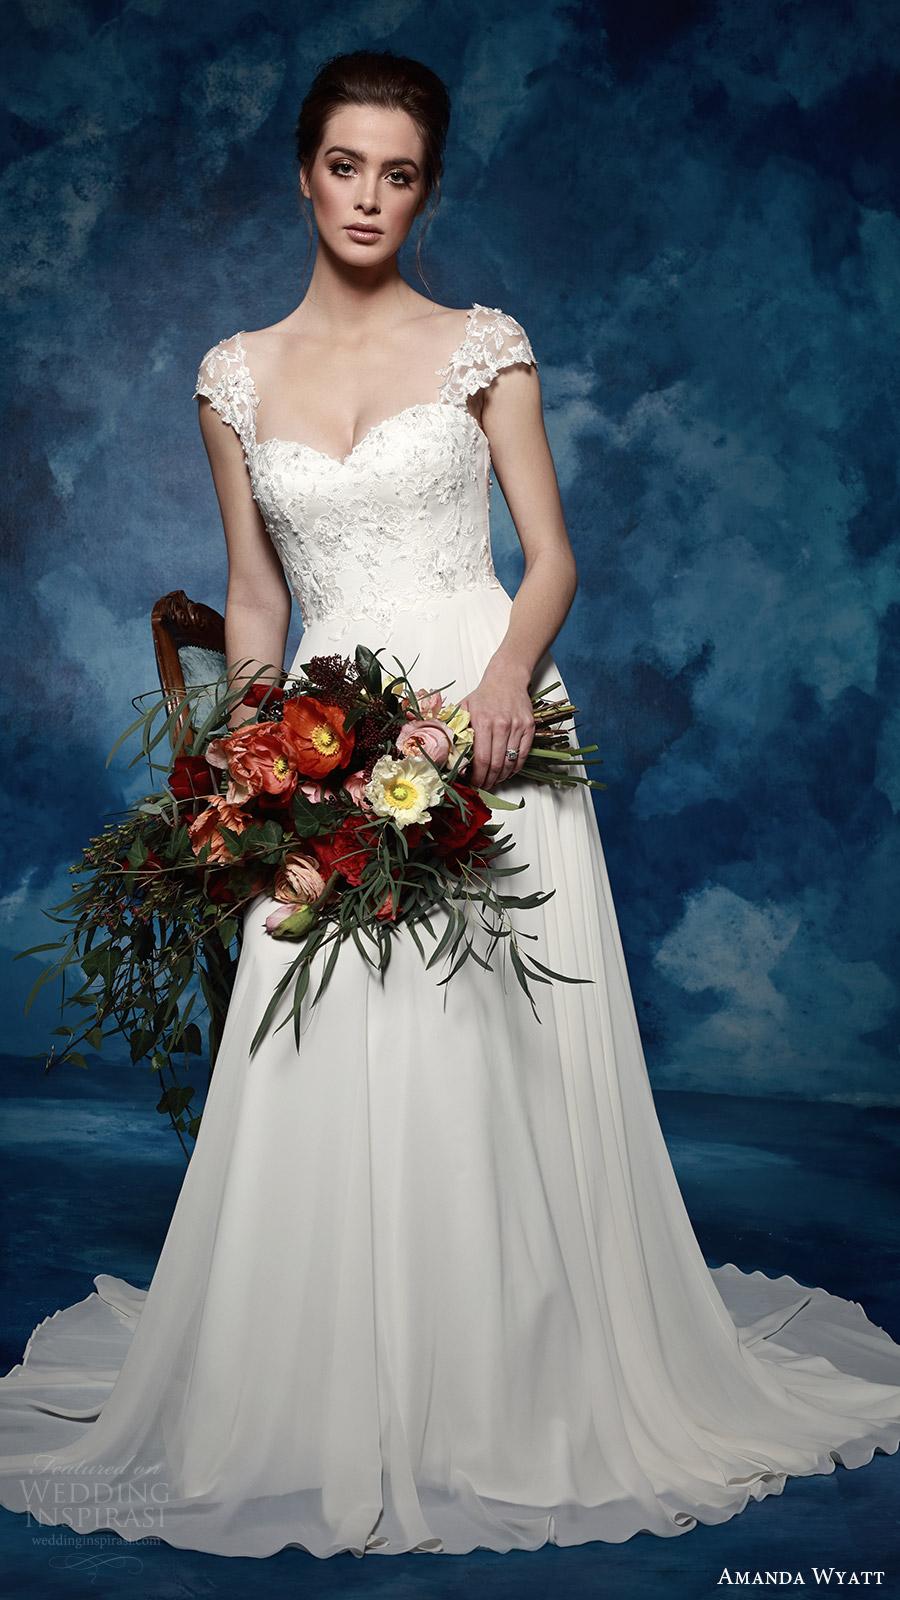 amanda wyatt bridal 2017 illusion cap sleeves sweetheart a line wedding dress (violette) mv train romantic elegant